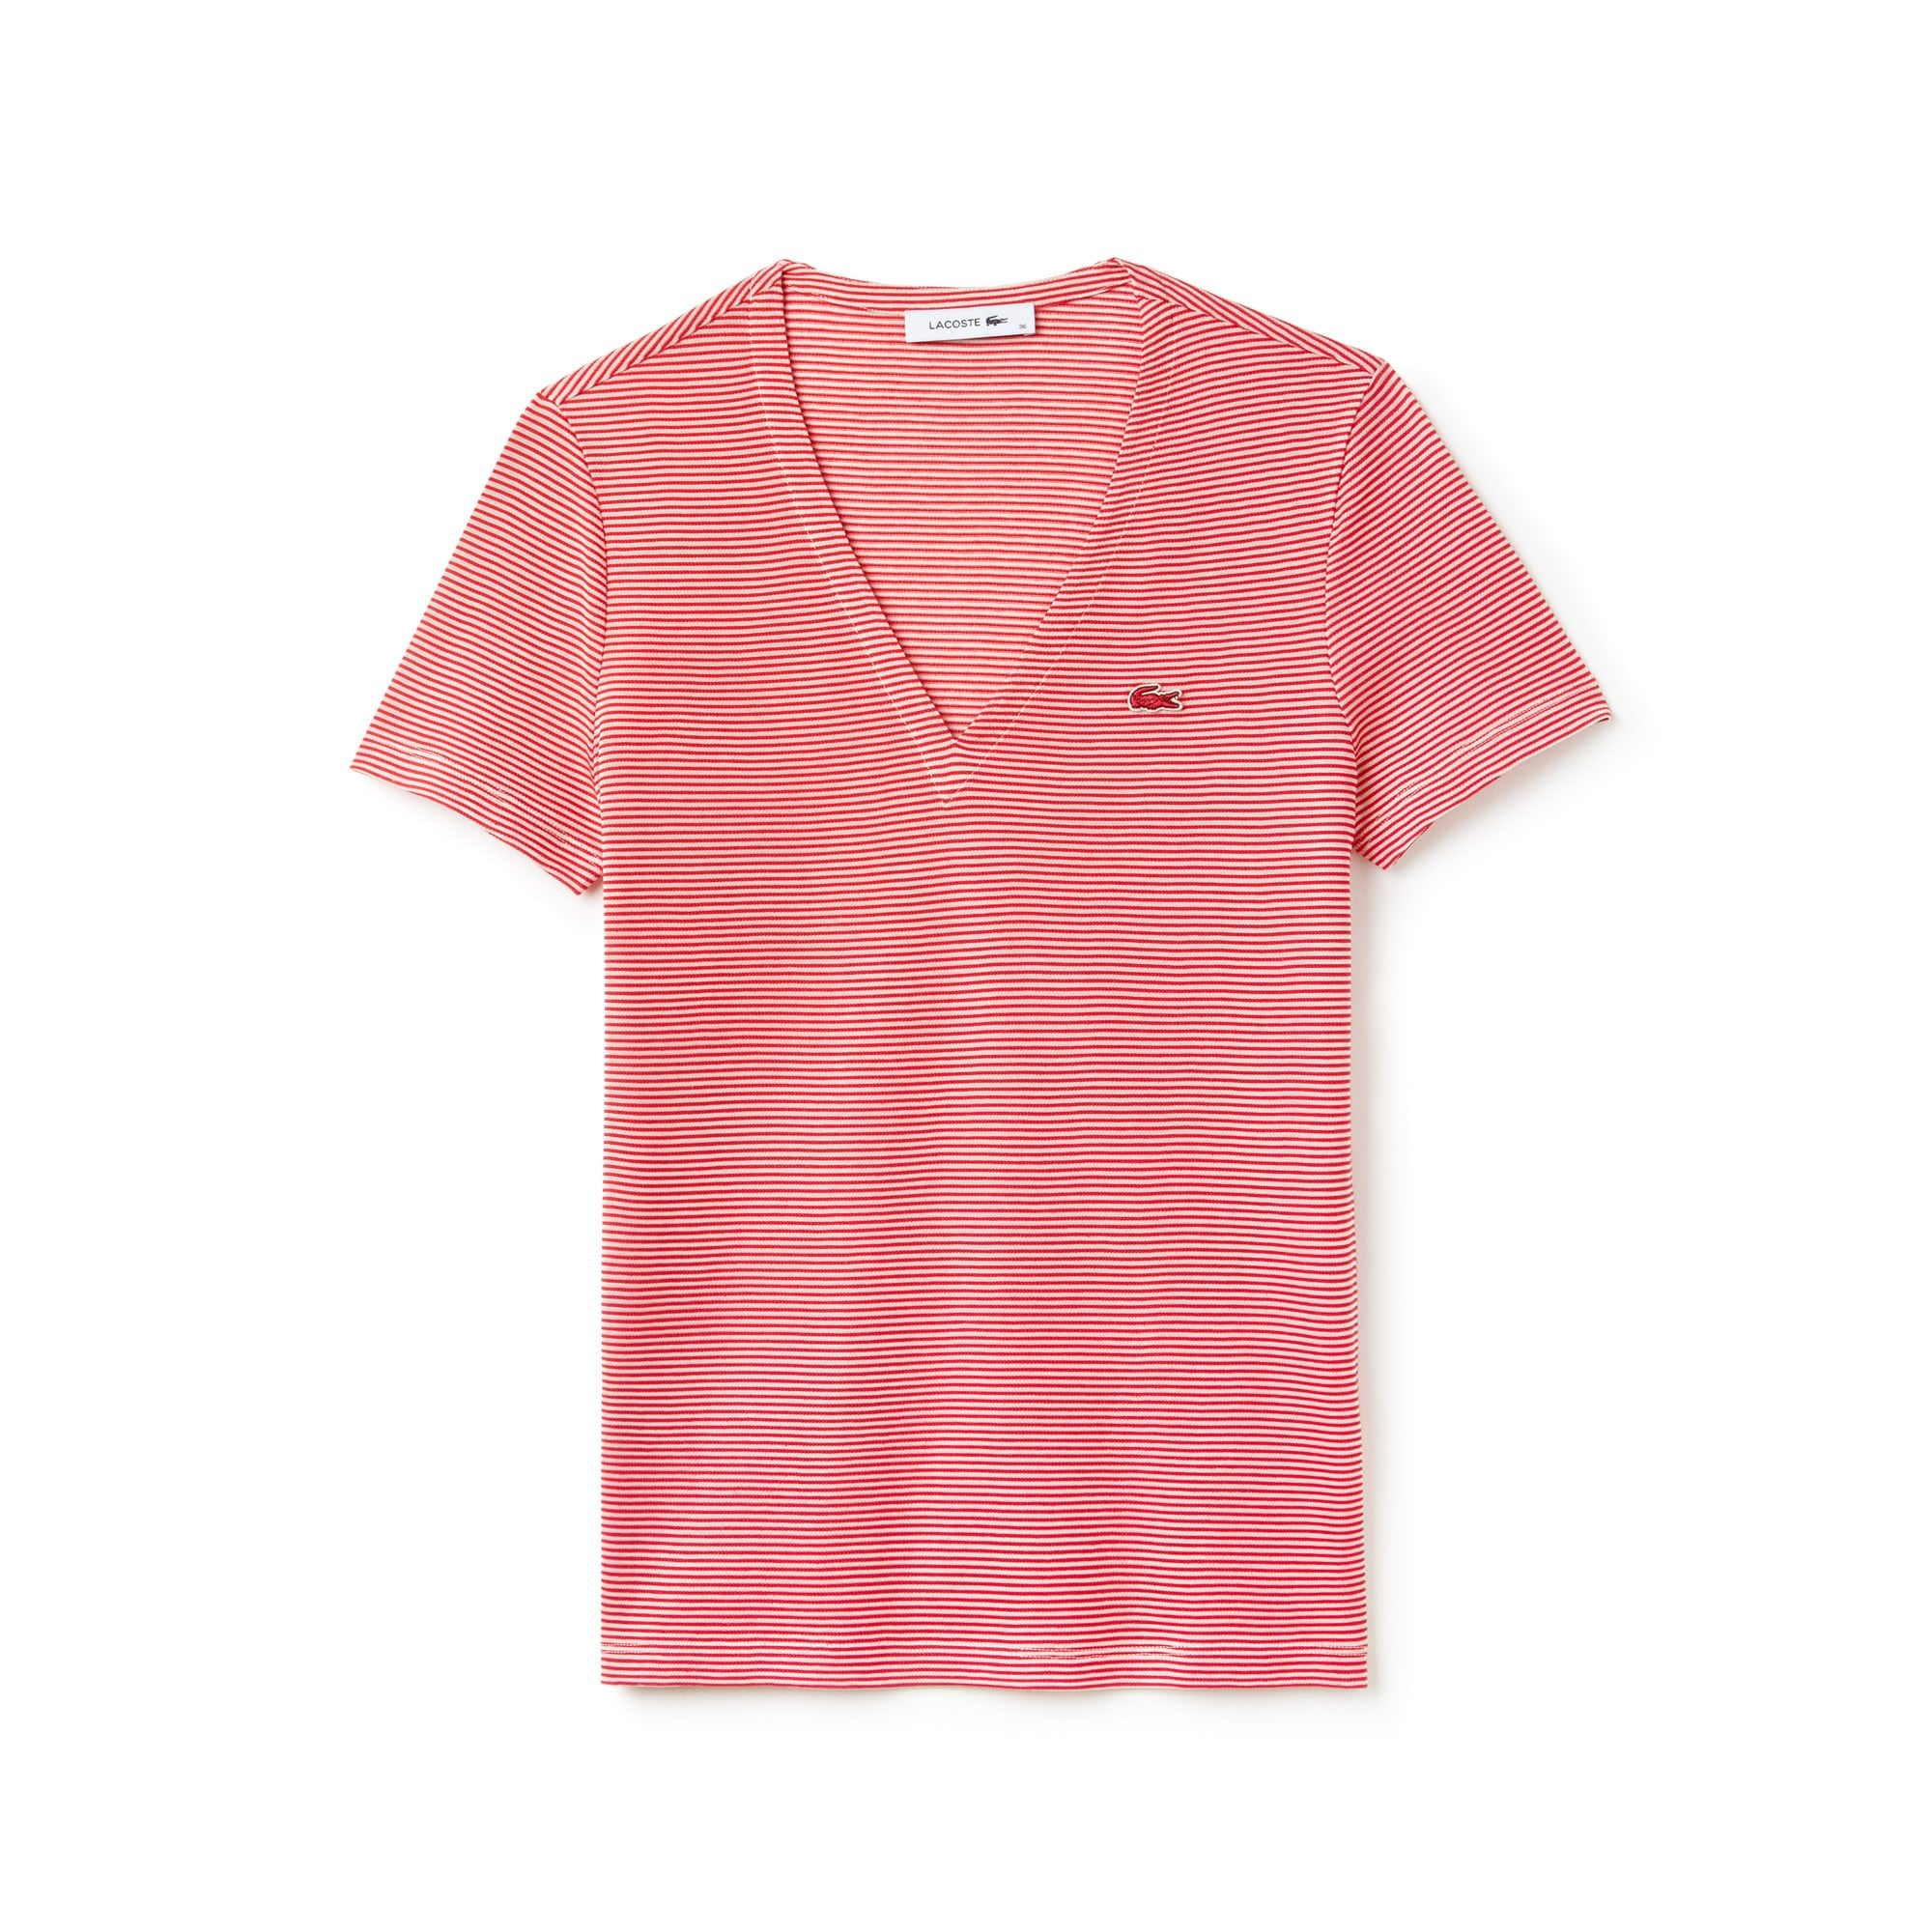 Camiseta Mujer Rayas Cuello Pico